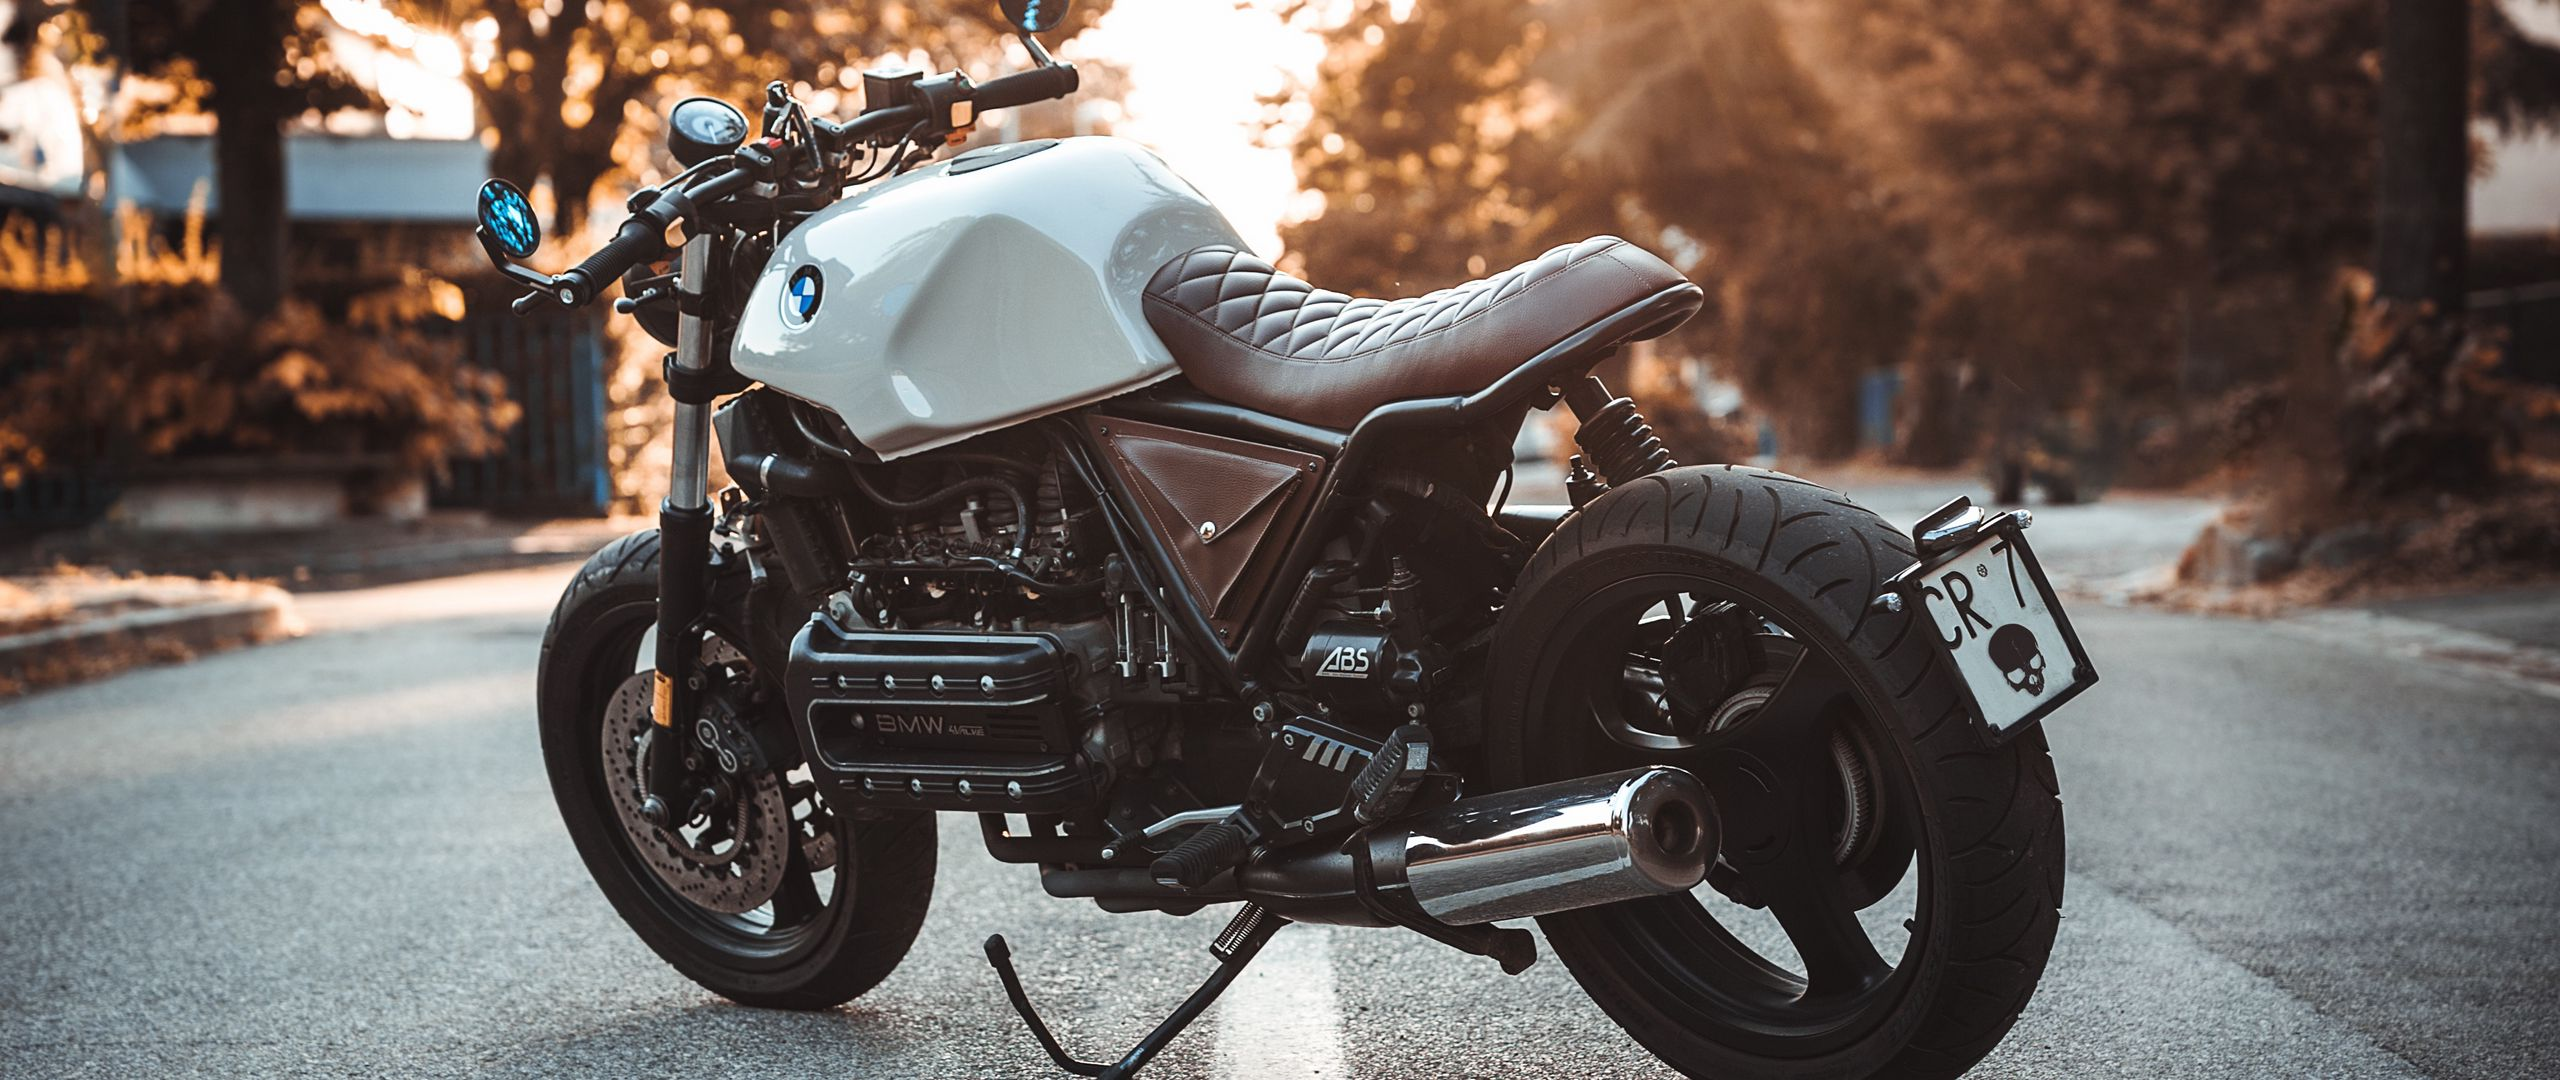 2560x1080 Обои bmw k100, мотоцикл, байк, вид сбоку